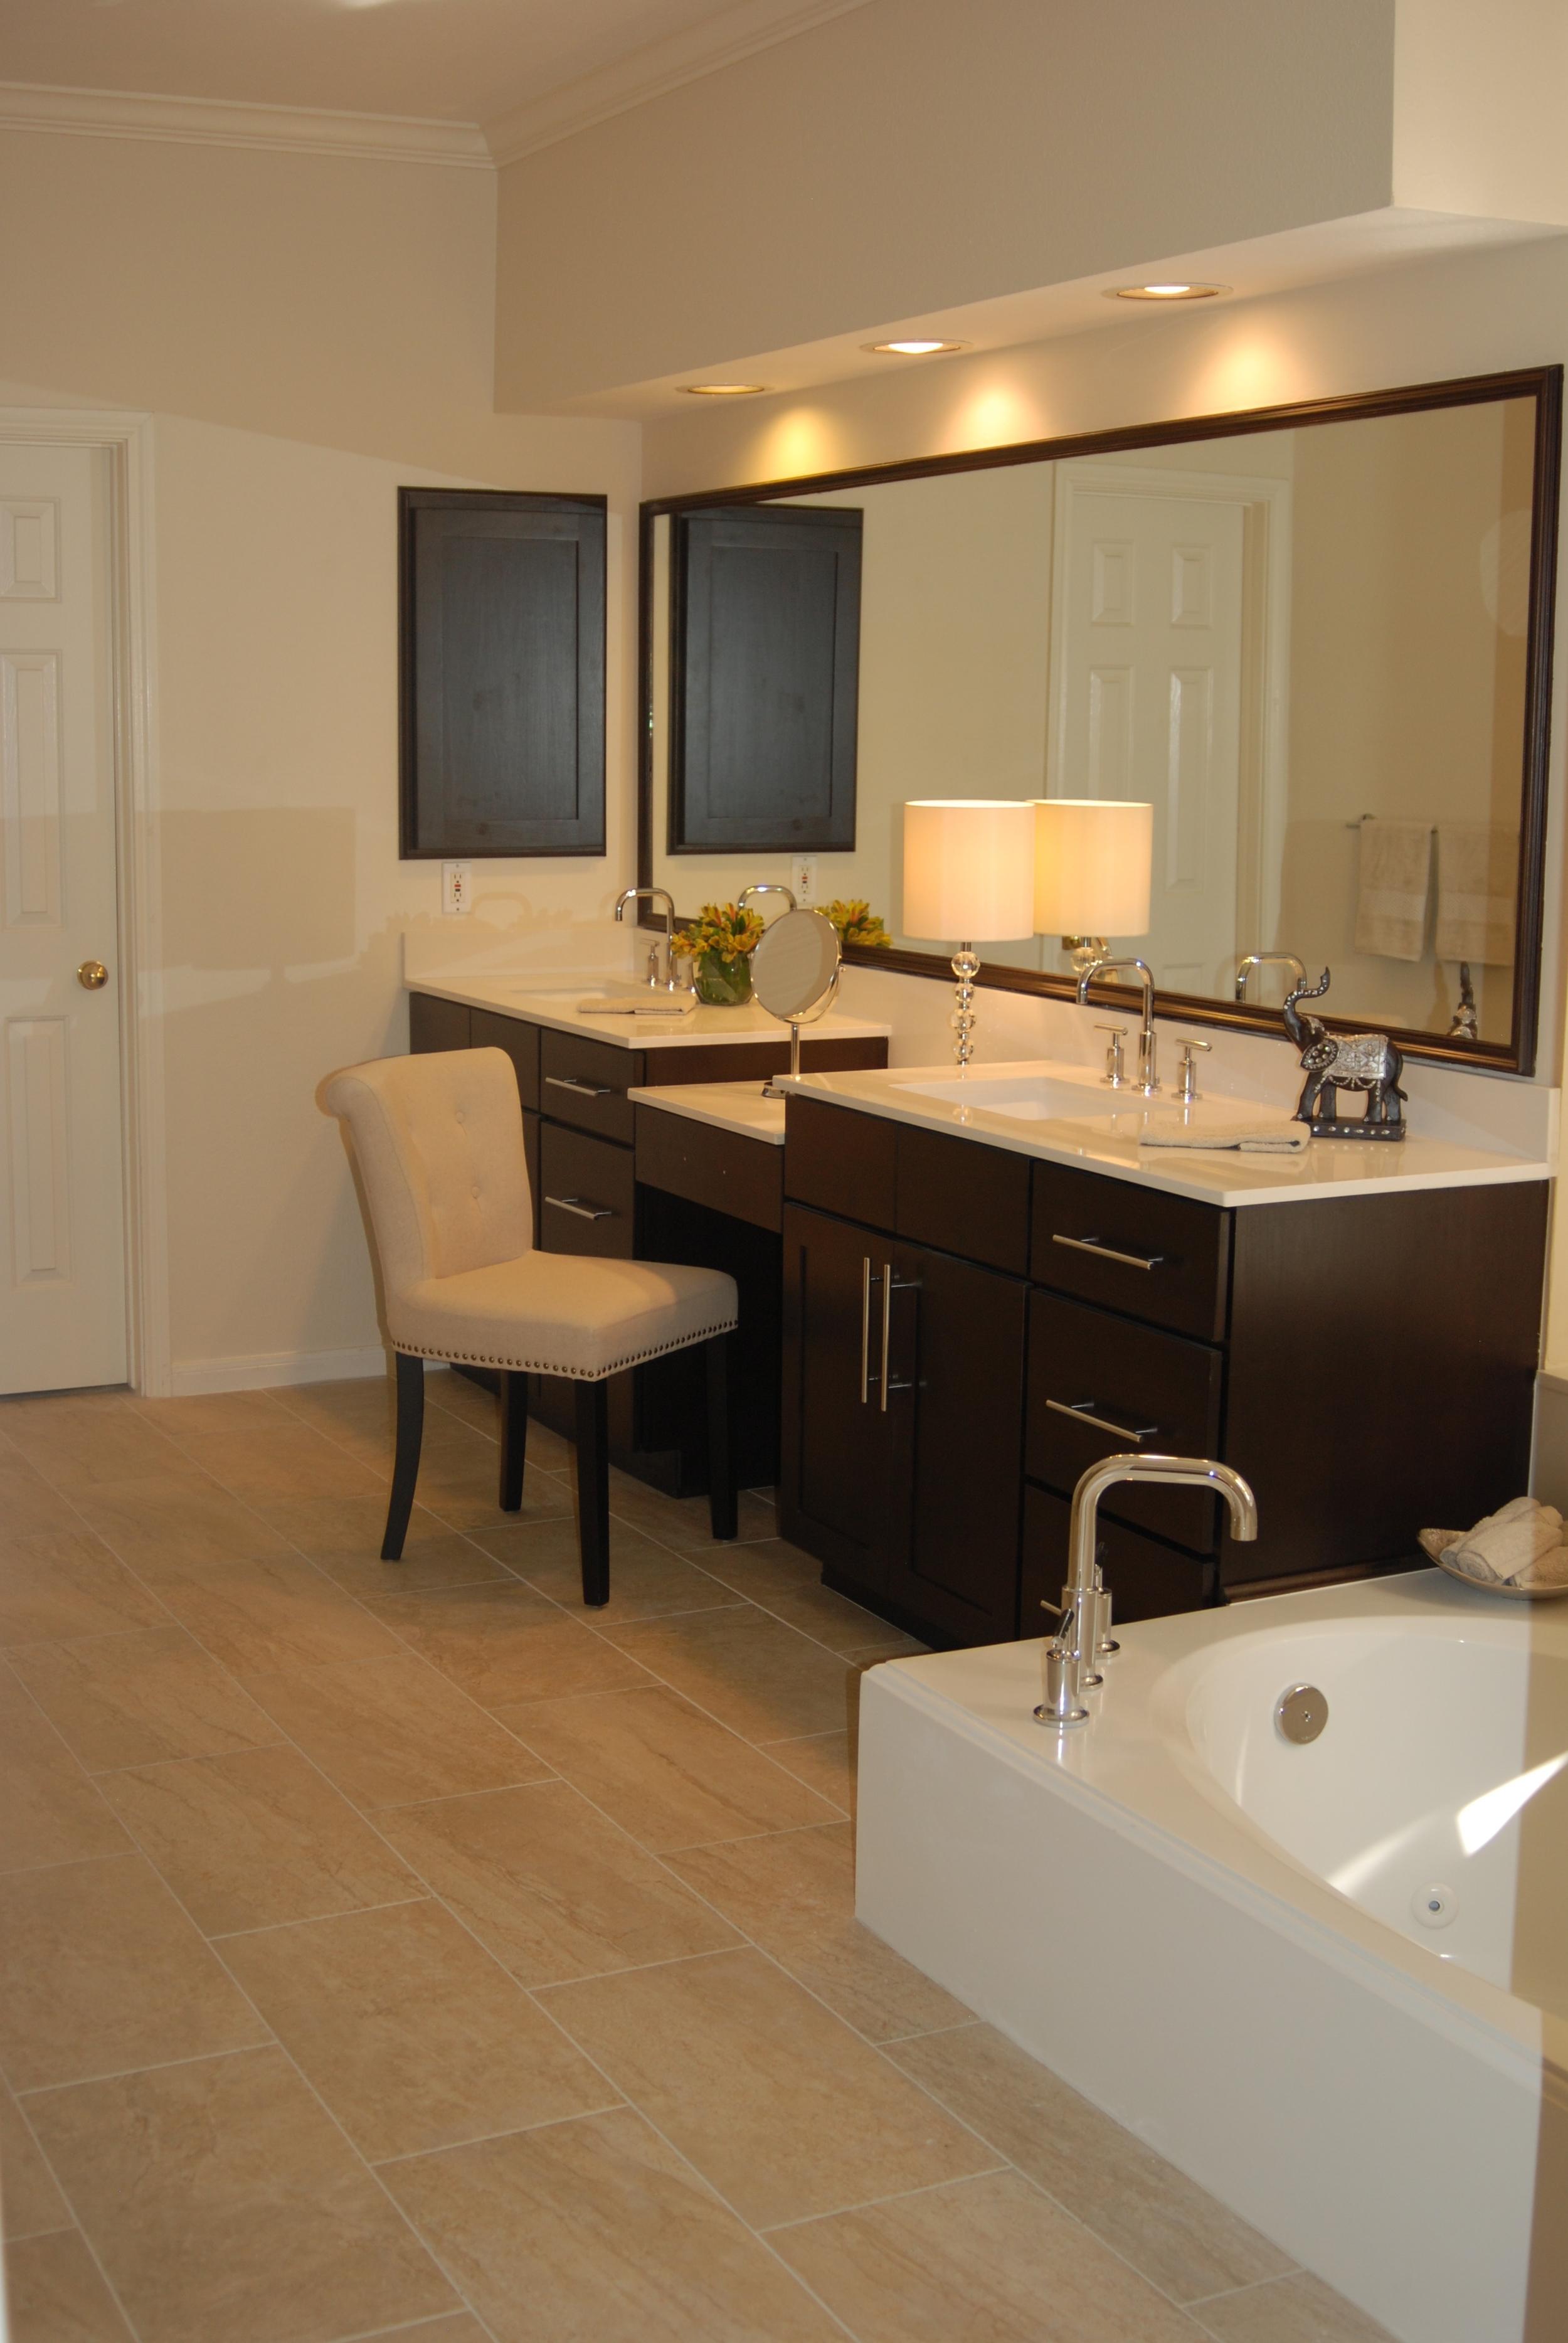 Dark Wallpaper Bathroom To Luxury Hotel Bathroom Whodid It Design